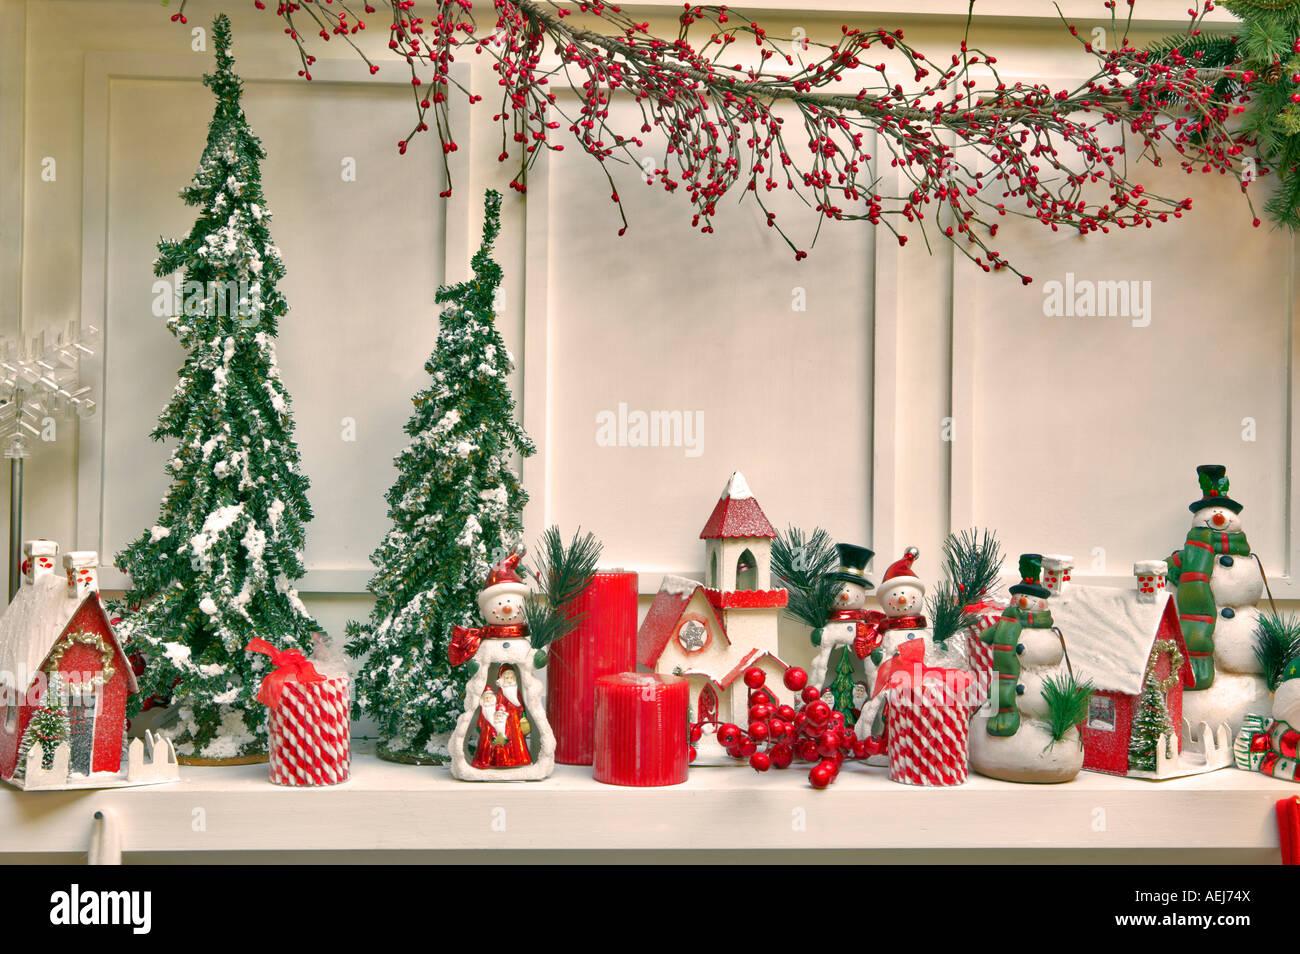 weihnachts dekorationen auf kaminumhang al s kindergarten woodburn oregon stockbild - Kaminumhang Dekorationen